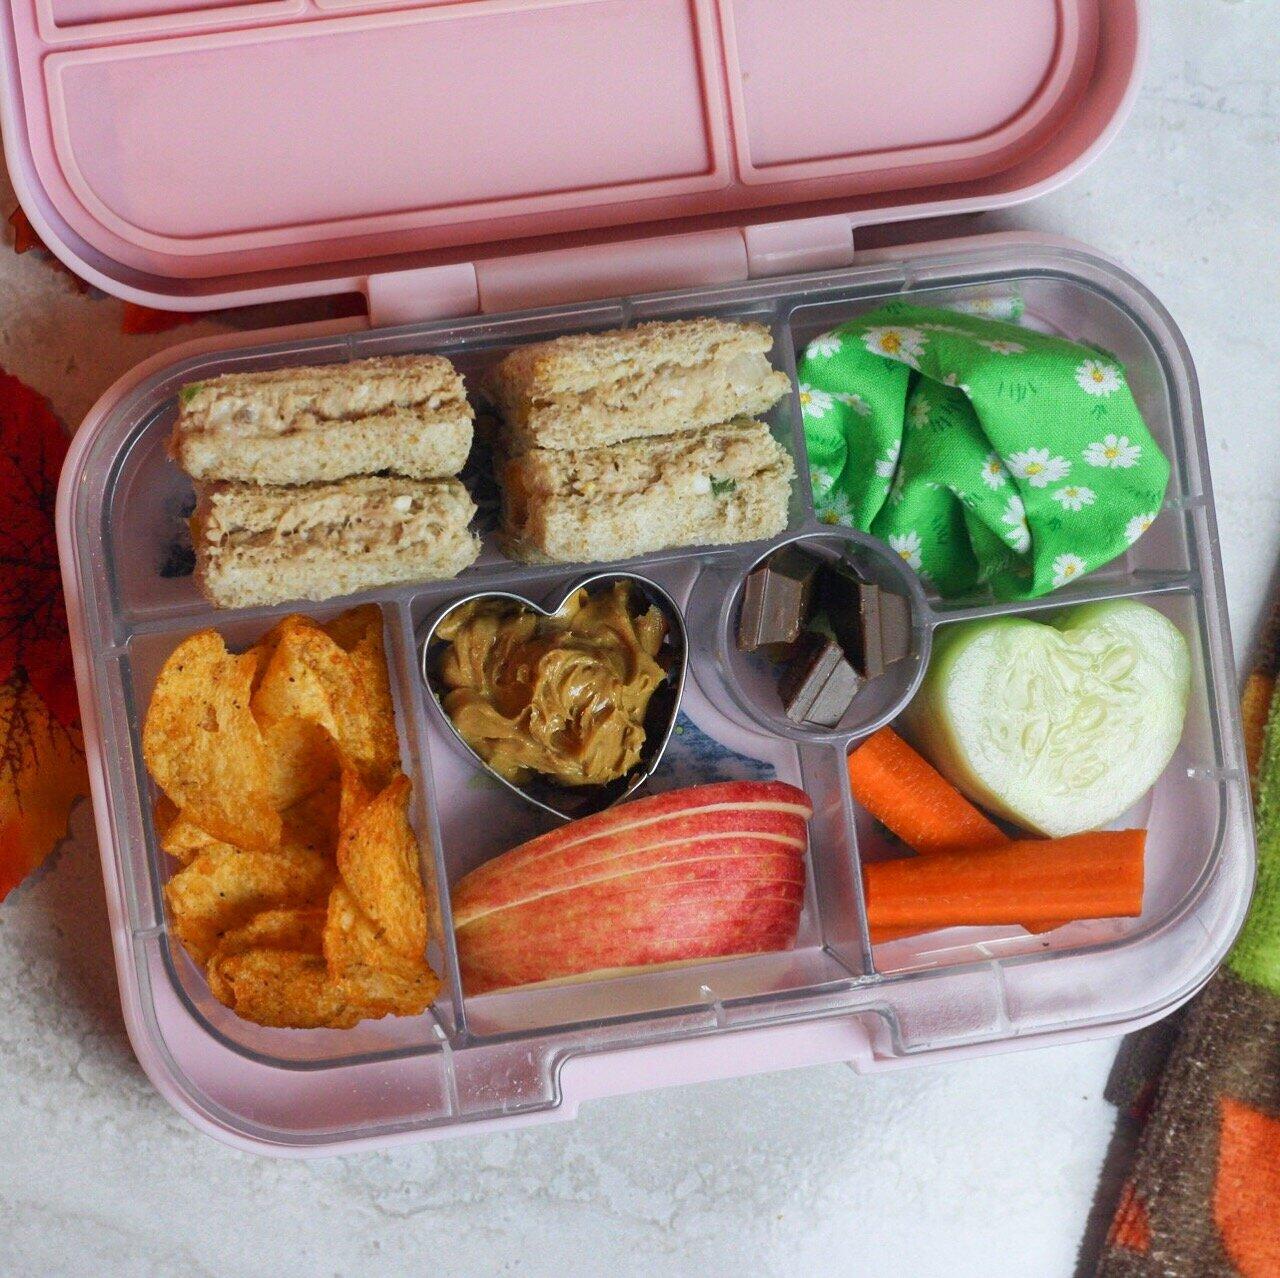 tuna sammie's anyone? - Tuna sandwiches,barbecue chips,apples + peanut butter,cucumbers + carrots,kit-kats!